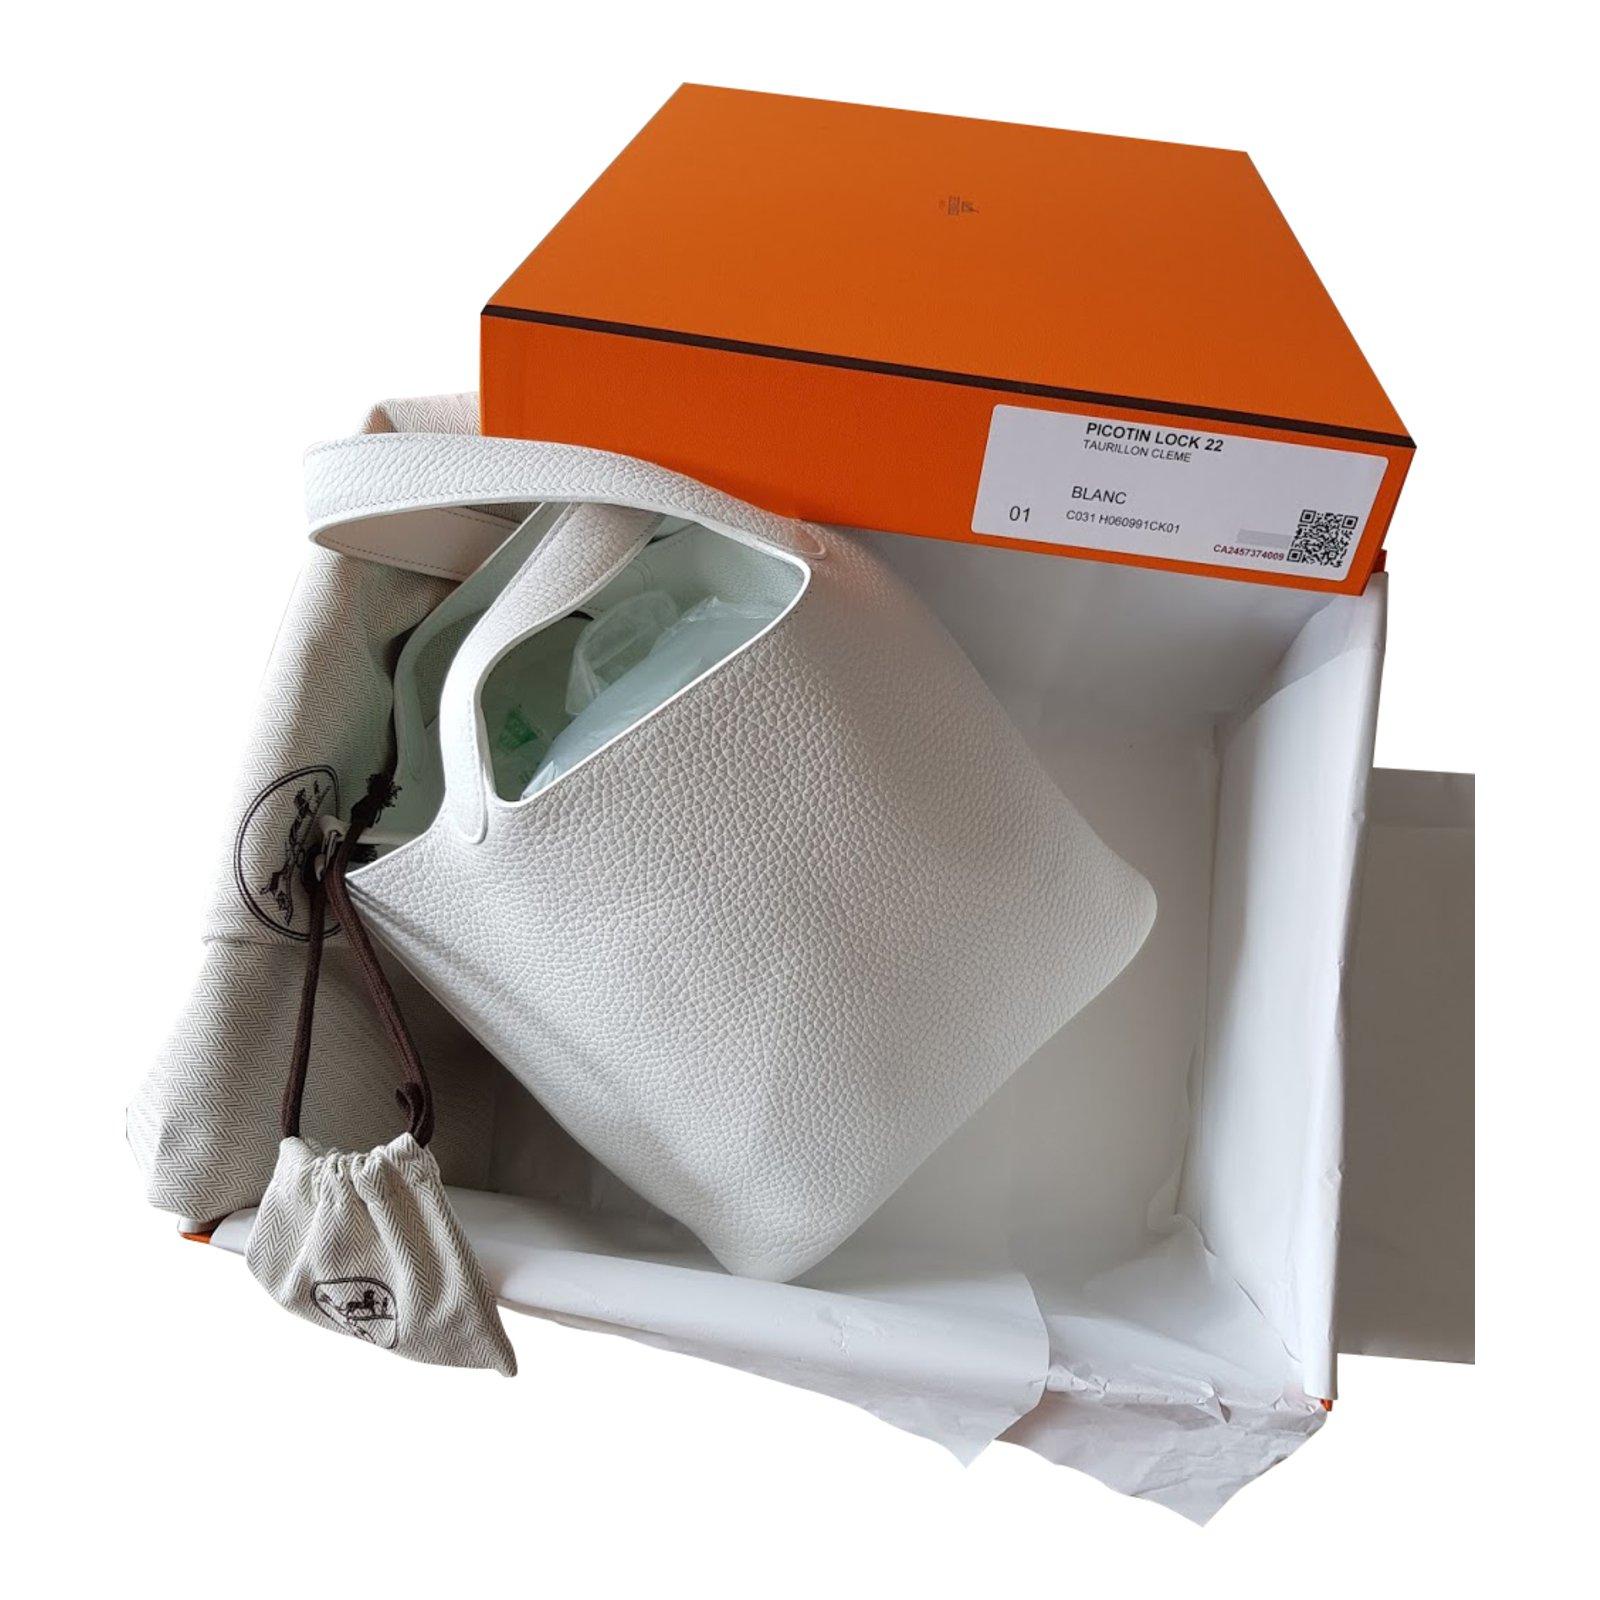 3771d0e82e Sacs à main Hermès PICOTIN LOCK 22 TAURILLON CLEMENCE BLANC Cuir Blanc  ref.44214